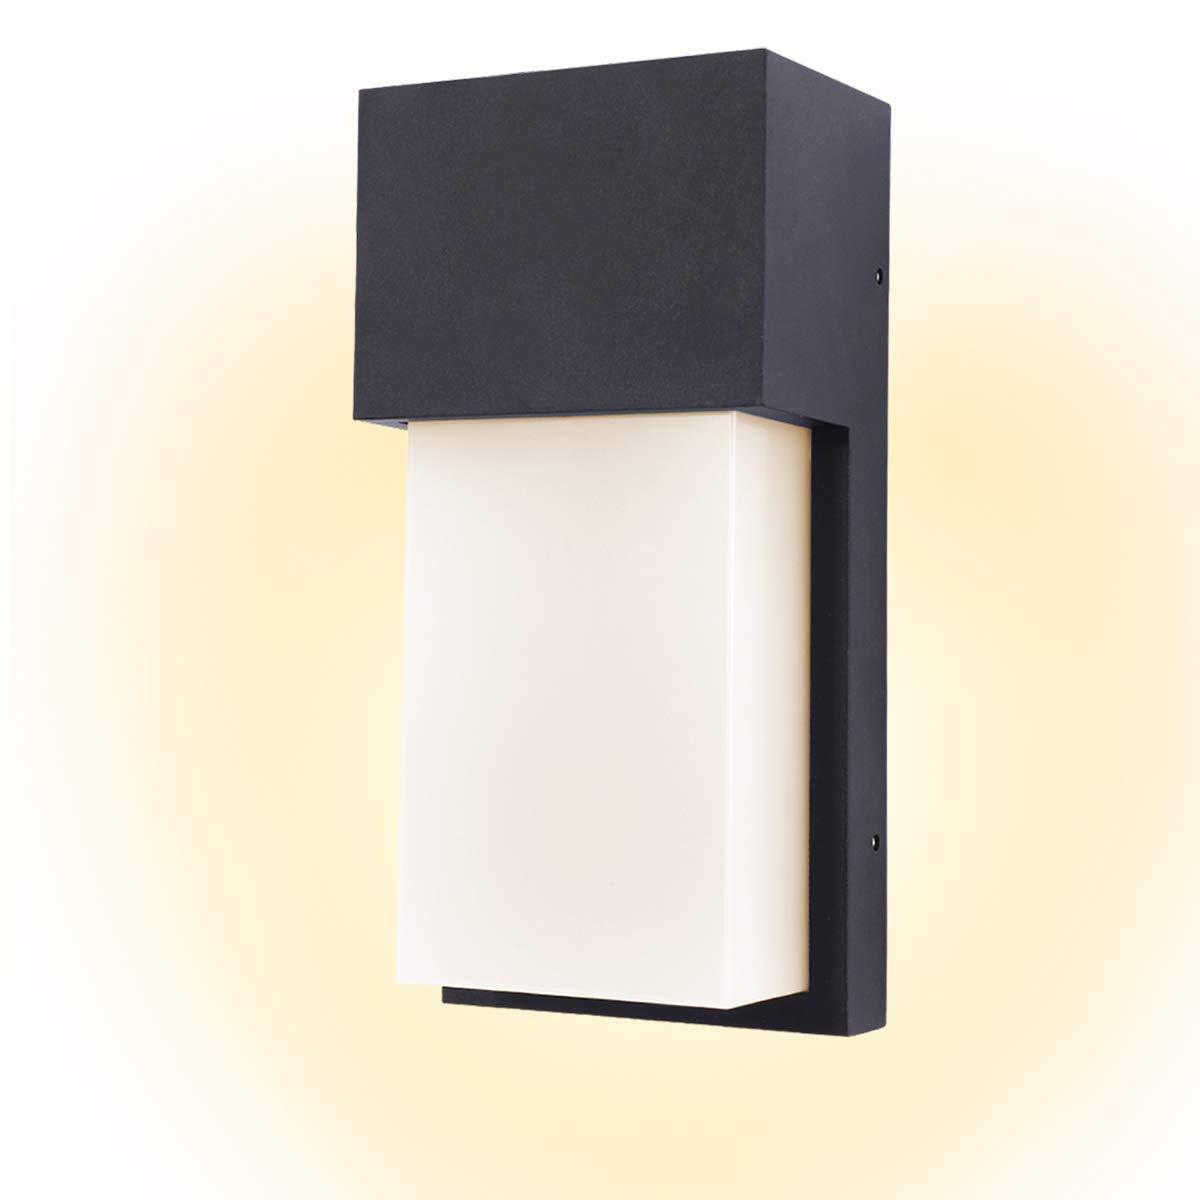 Kernorv led wall sconce modern wall sconce 10w warm white waterproof outdoor wall light 4 7 x 9 7 black 10w